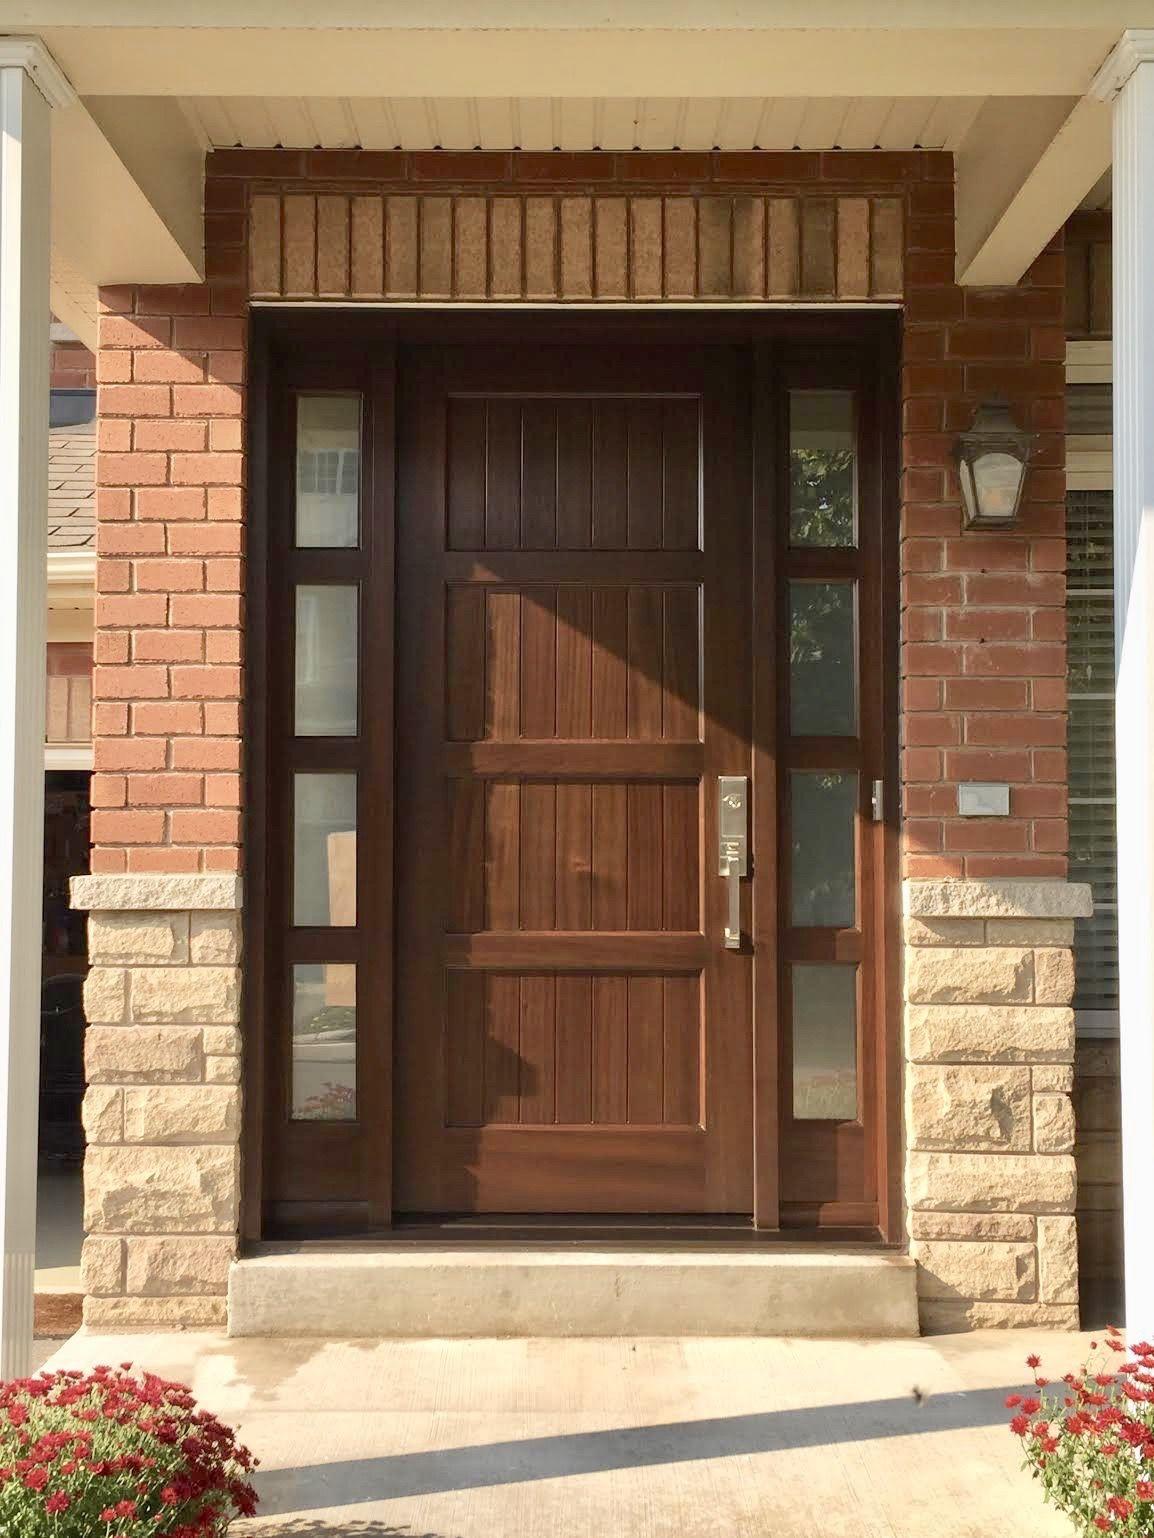 Amberwood Doors Inc: Spectacular *MODERN* #CustomMade #SolidMahogany